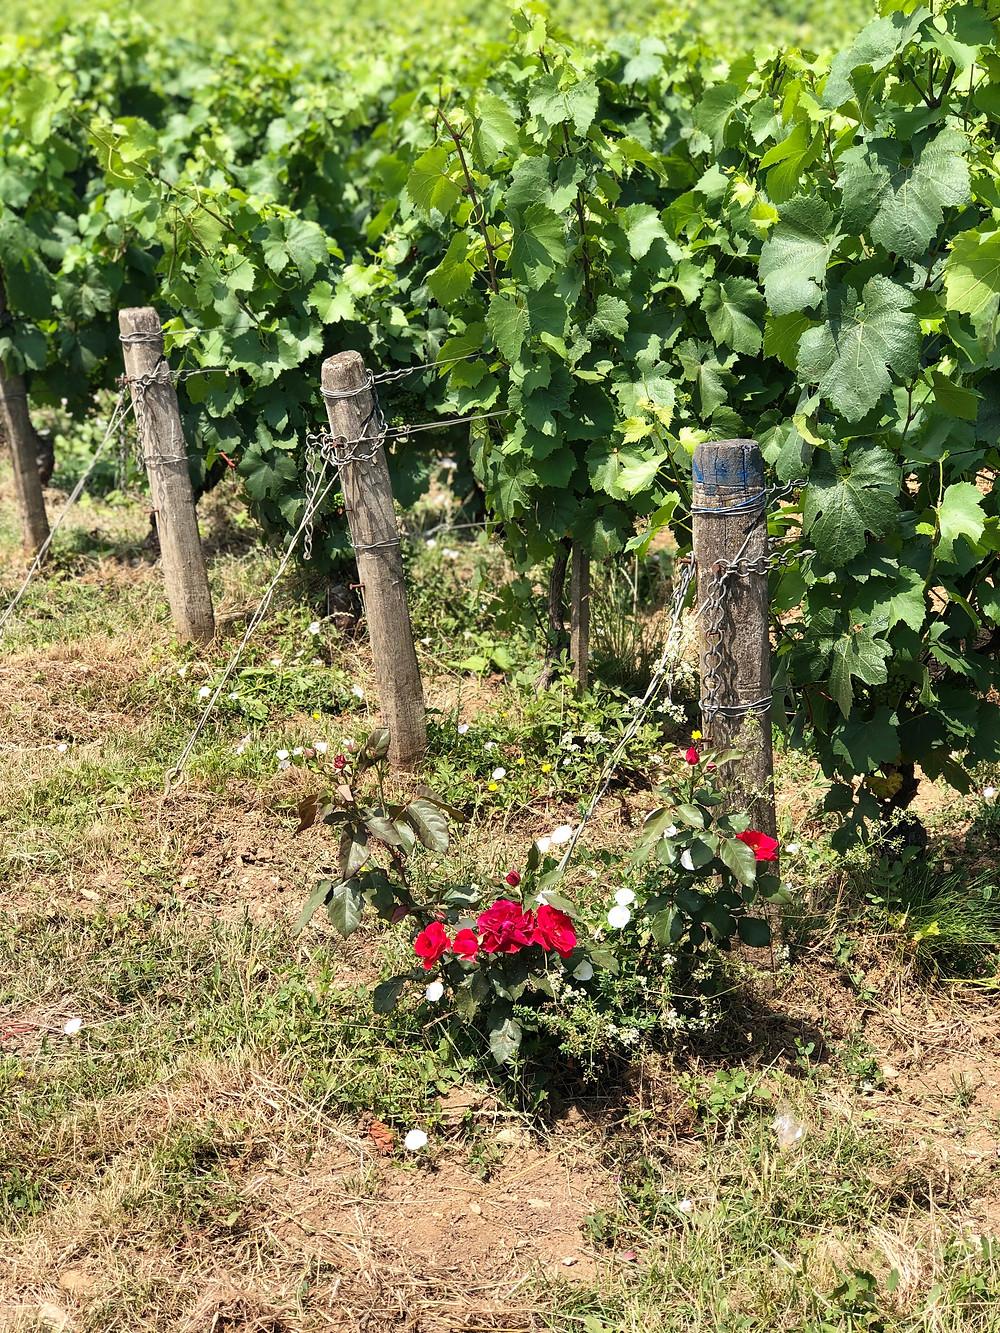 Biodynamic vineyard in Chablis Route des Grands Crus in Burgundy France